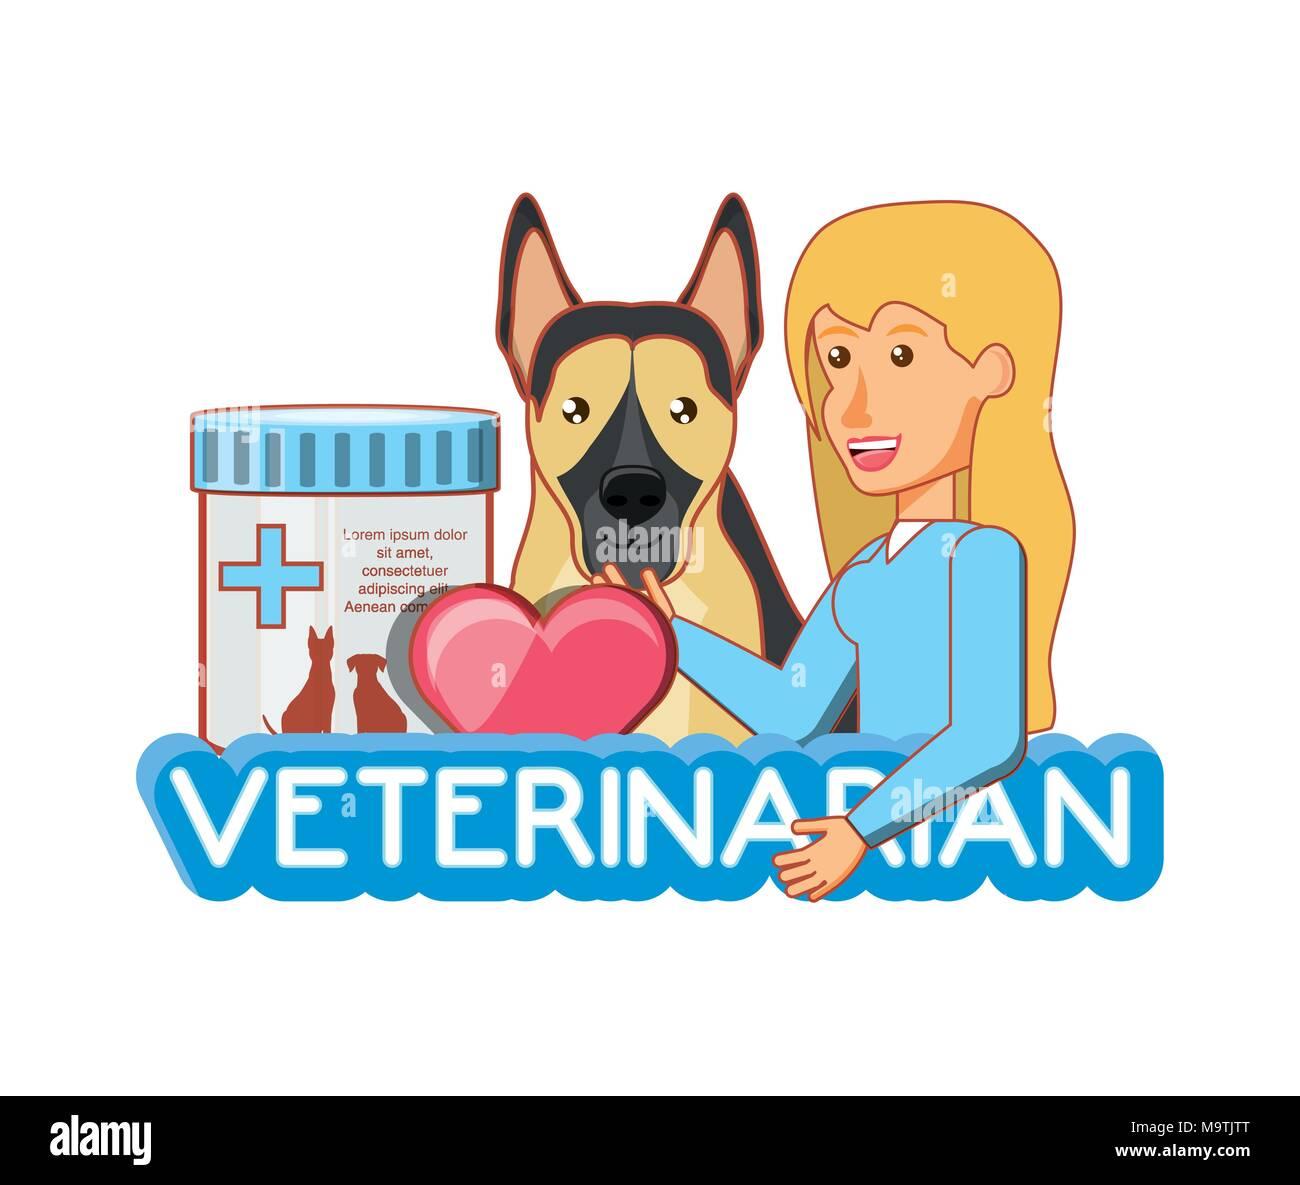 medicine for animals in veterinary vector illustration design - Stock Image